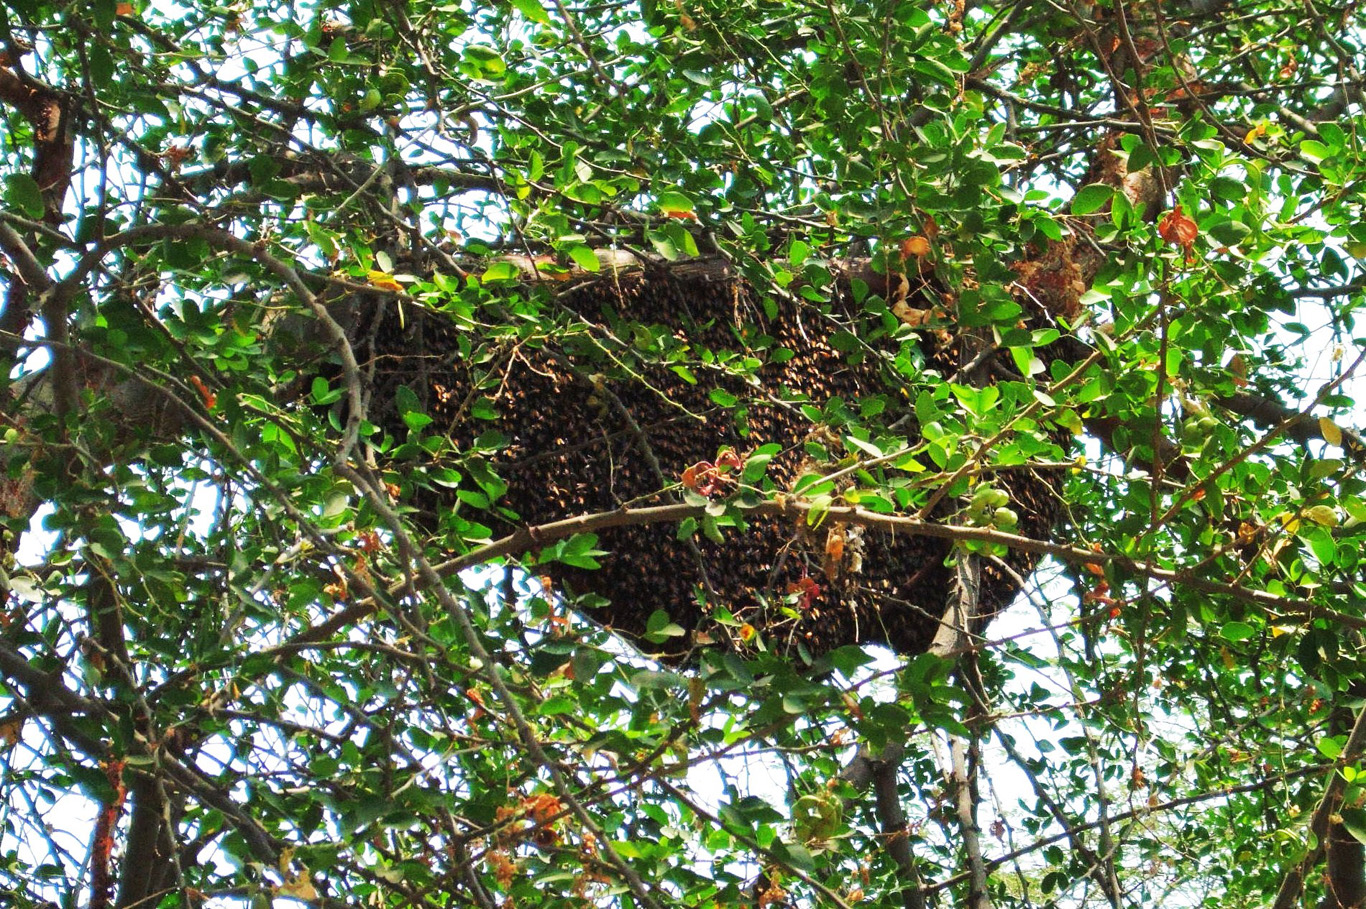 Bee nest on a tree